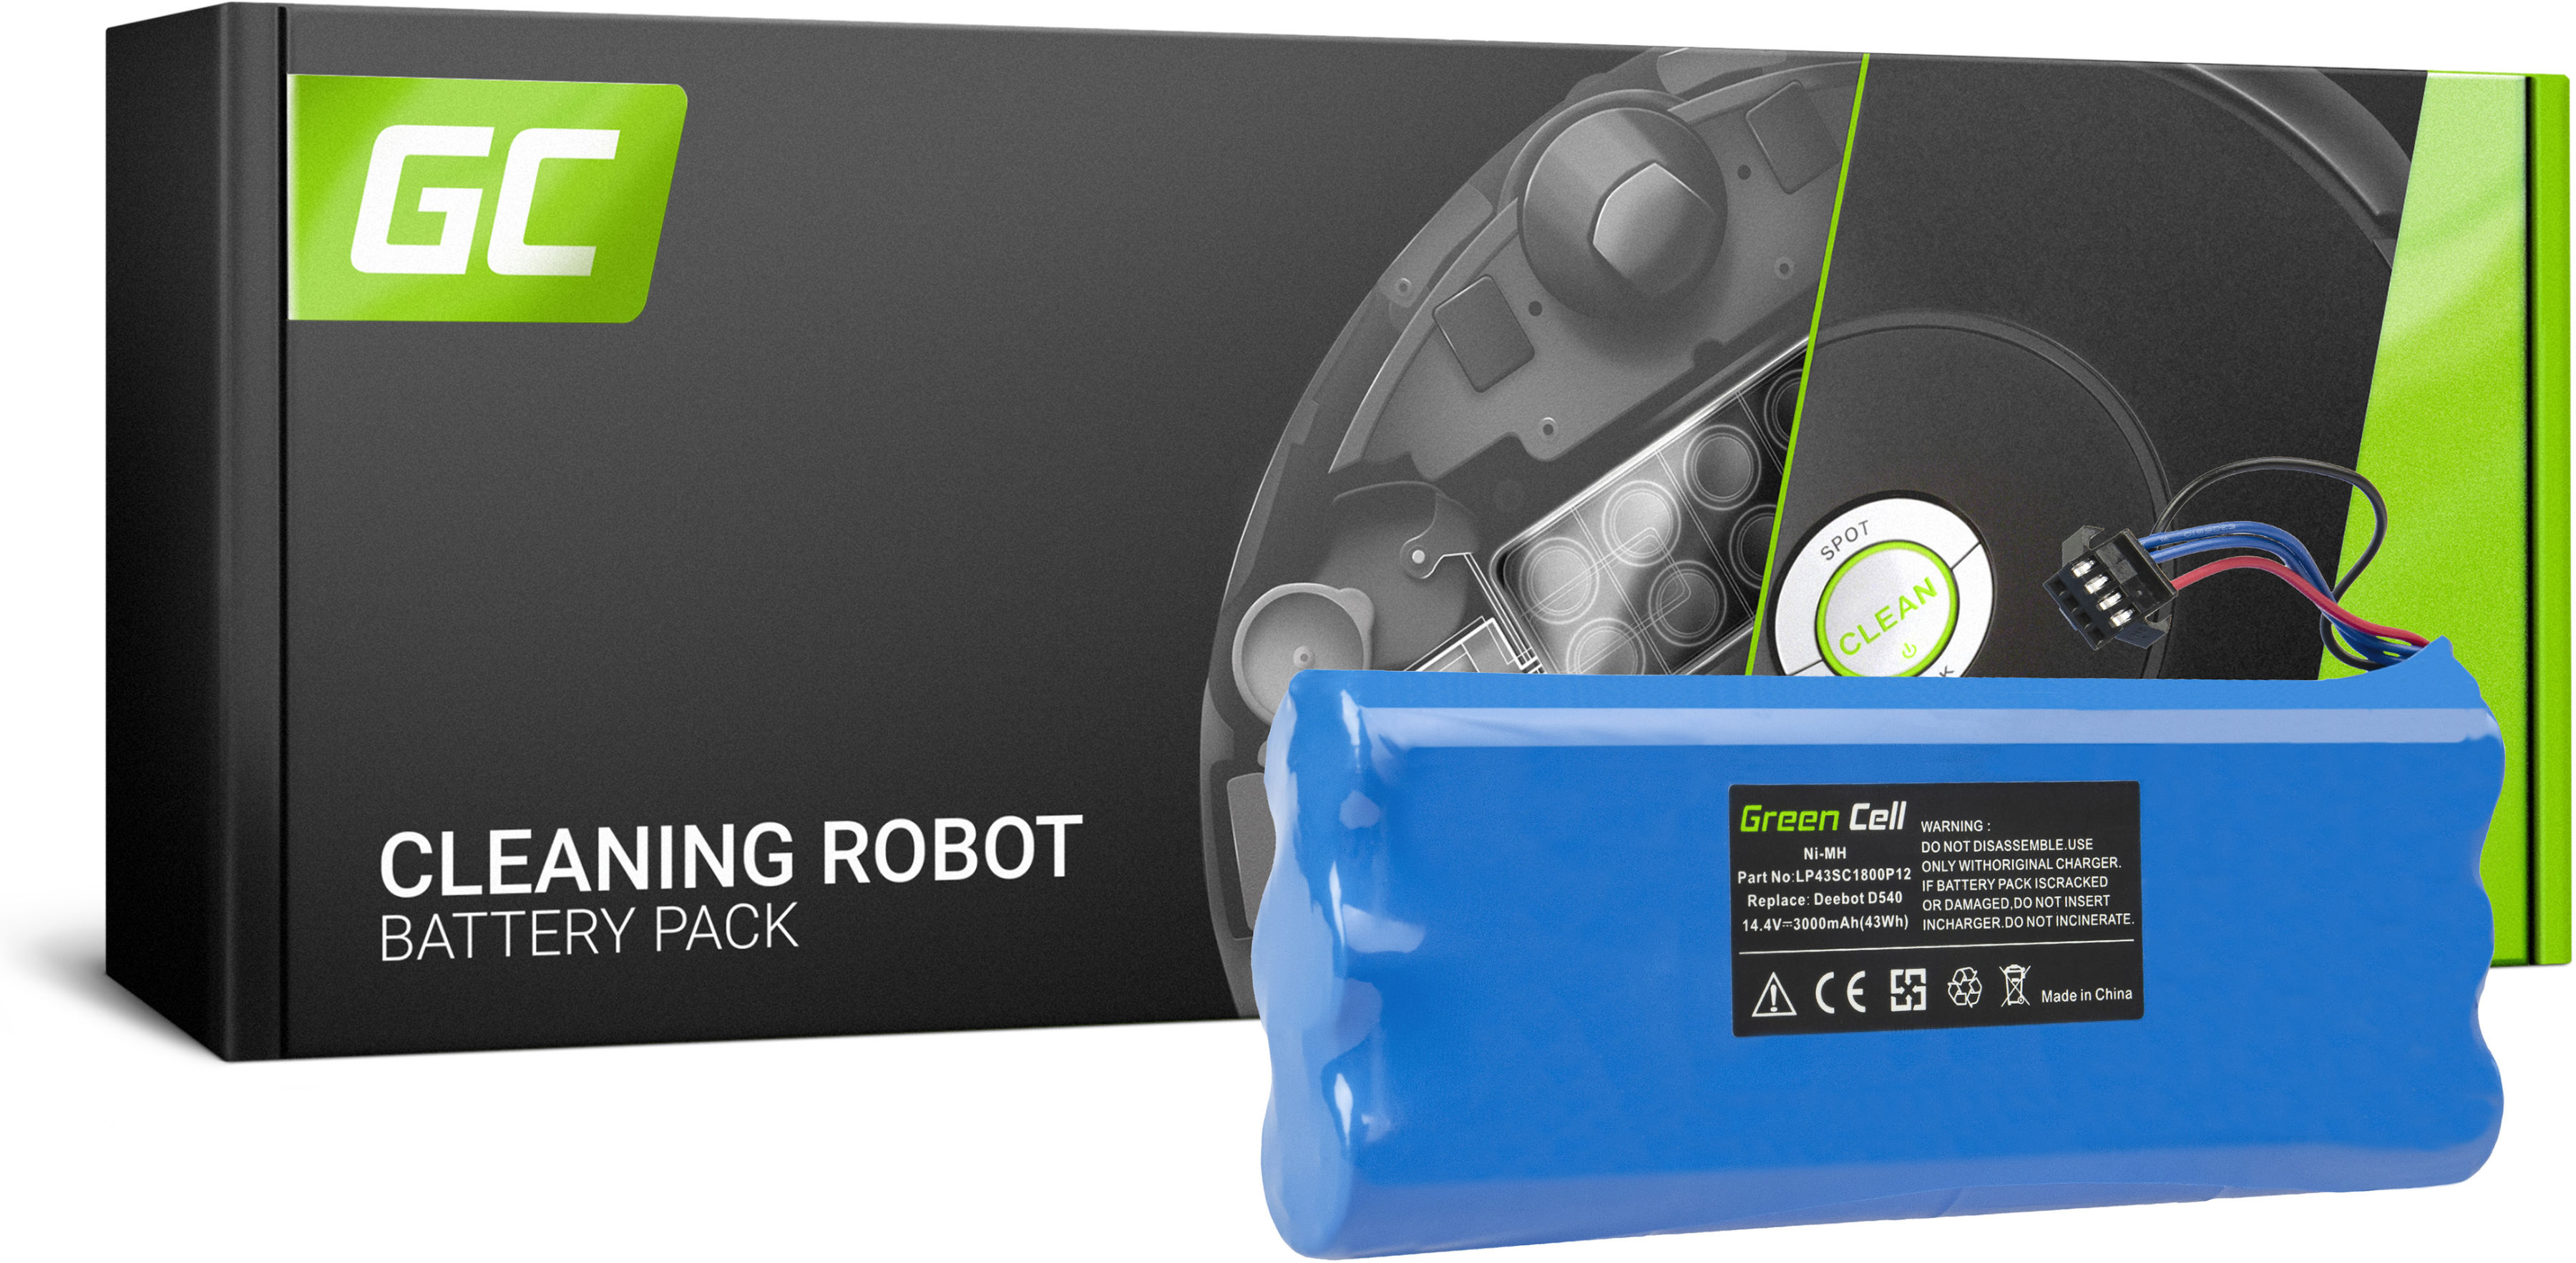 Bateria Akumulator (3Ah 14.4V) LP43SC1800P12 Green Cell do Ecovacs Deebot D523 D540 D550 D560 D570 D580